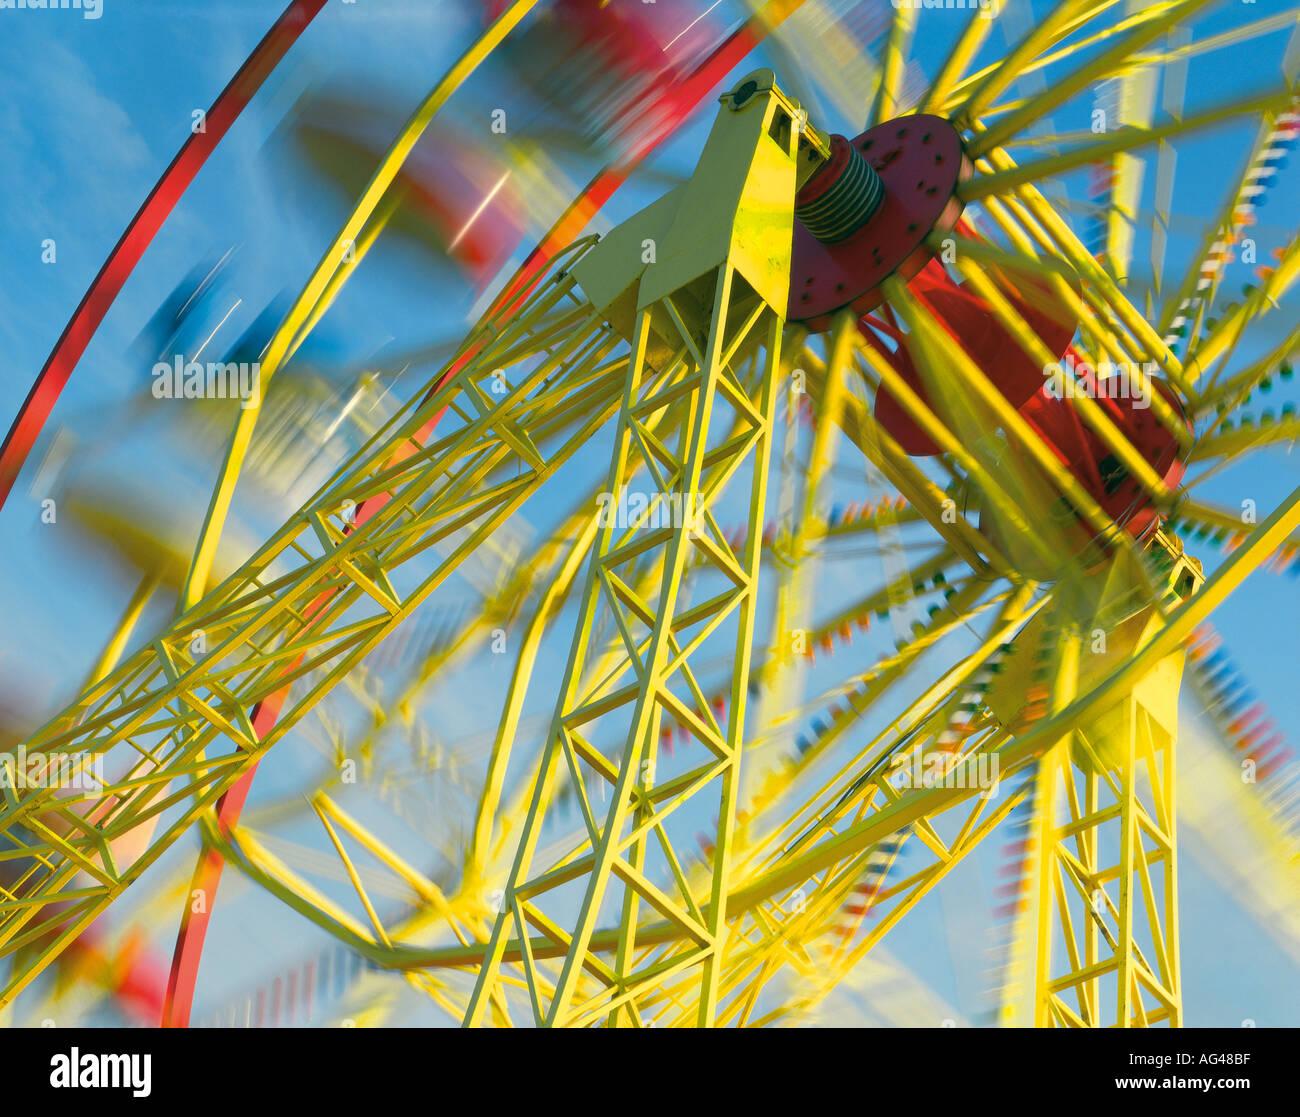 Ferris Wheel Horizontal - Stock Image